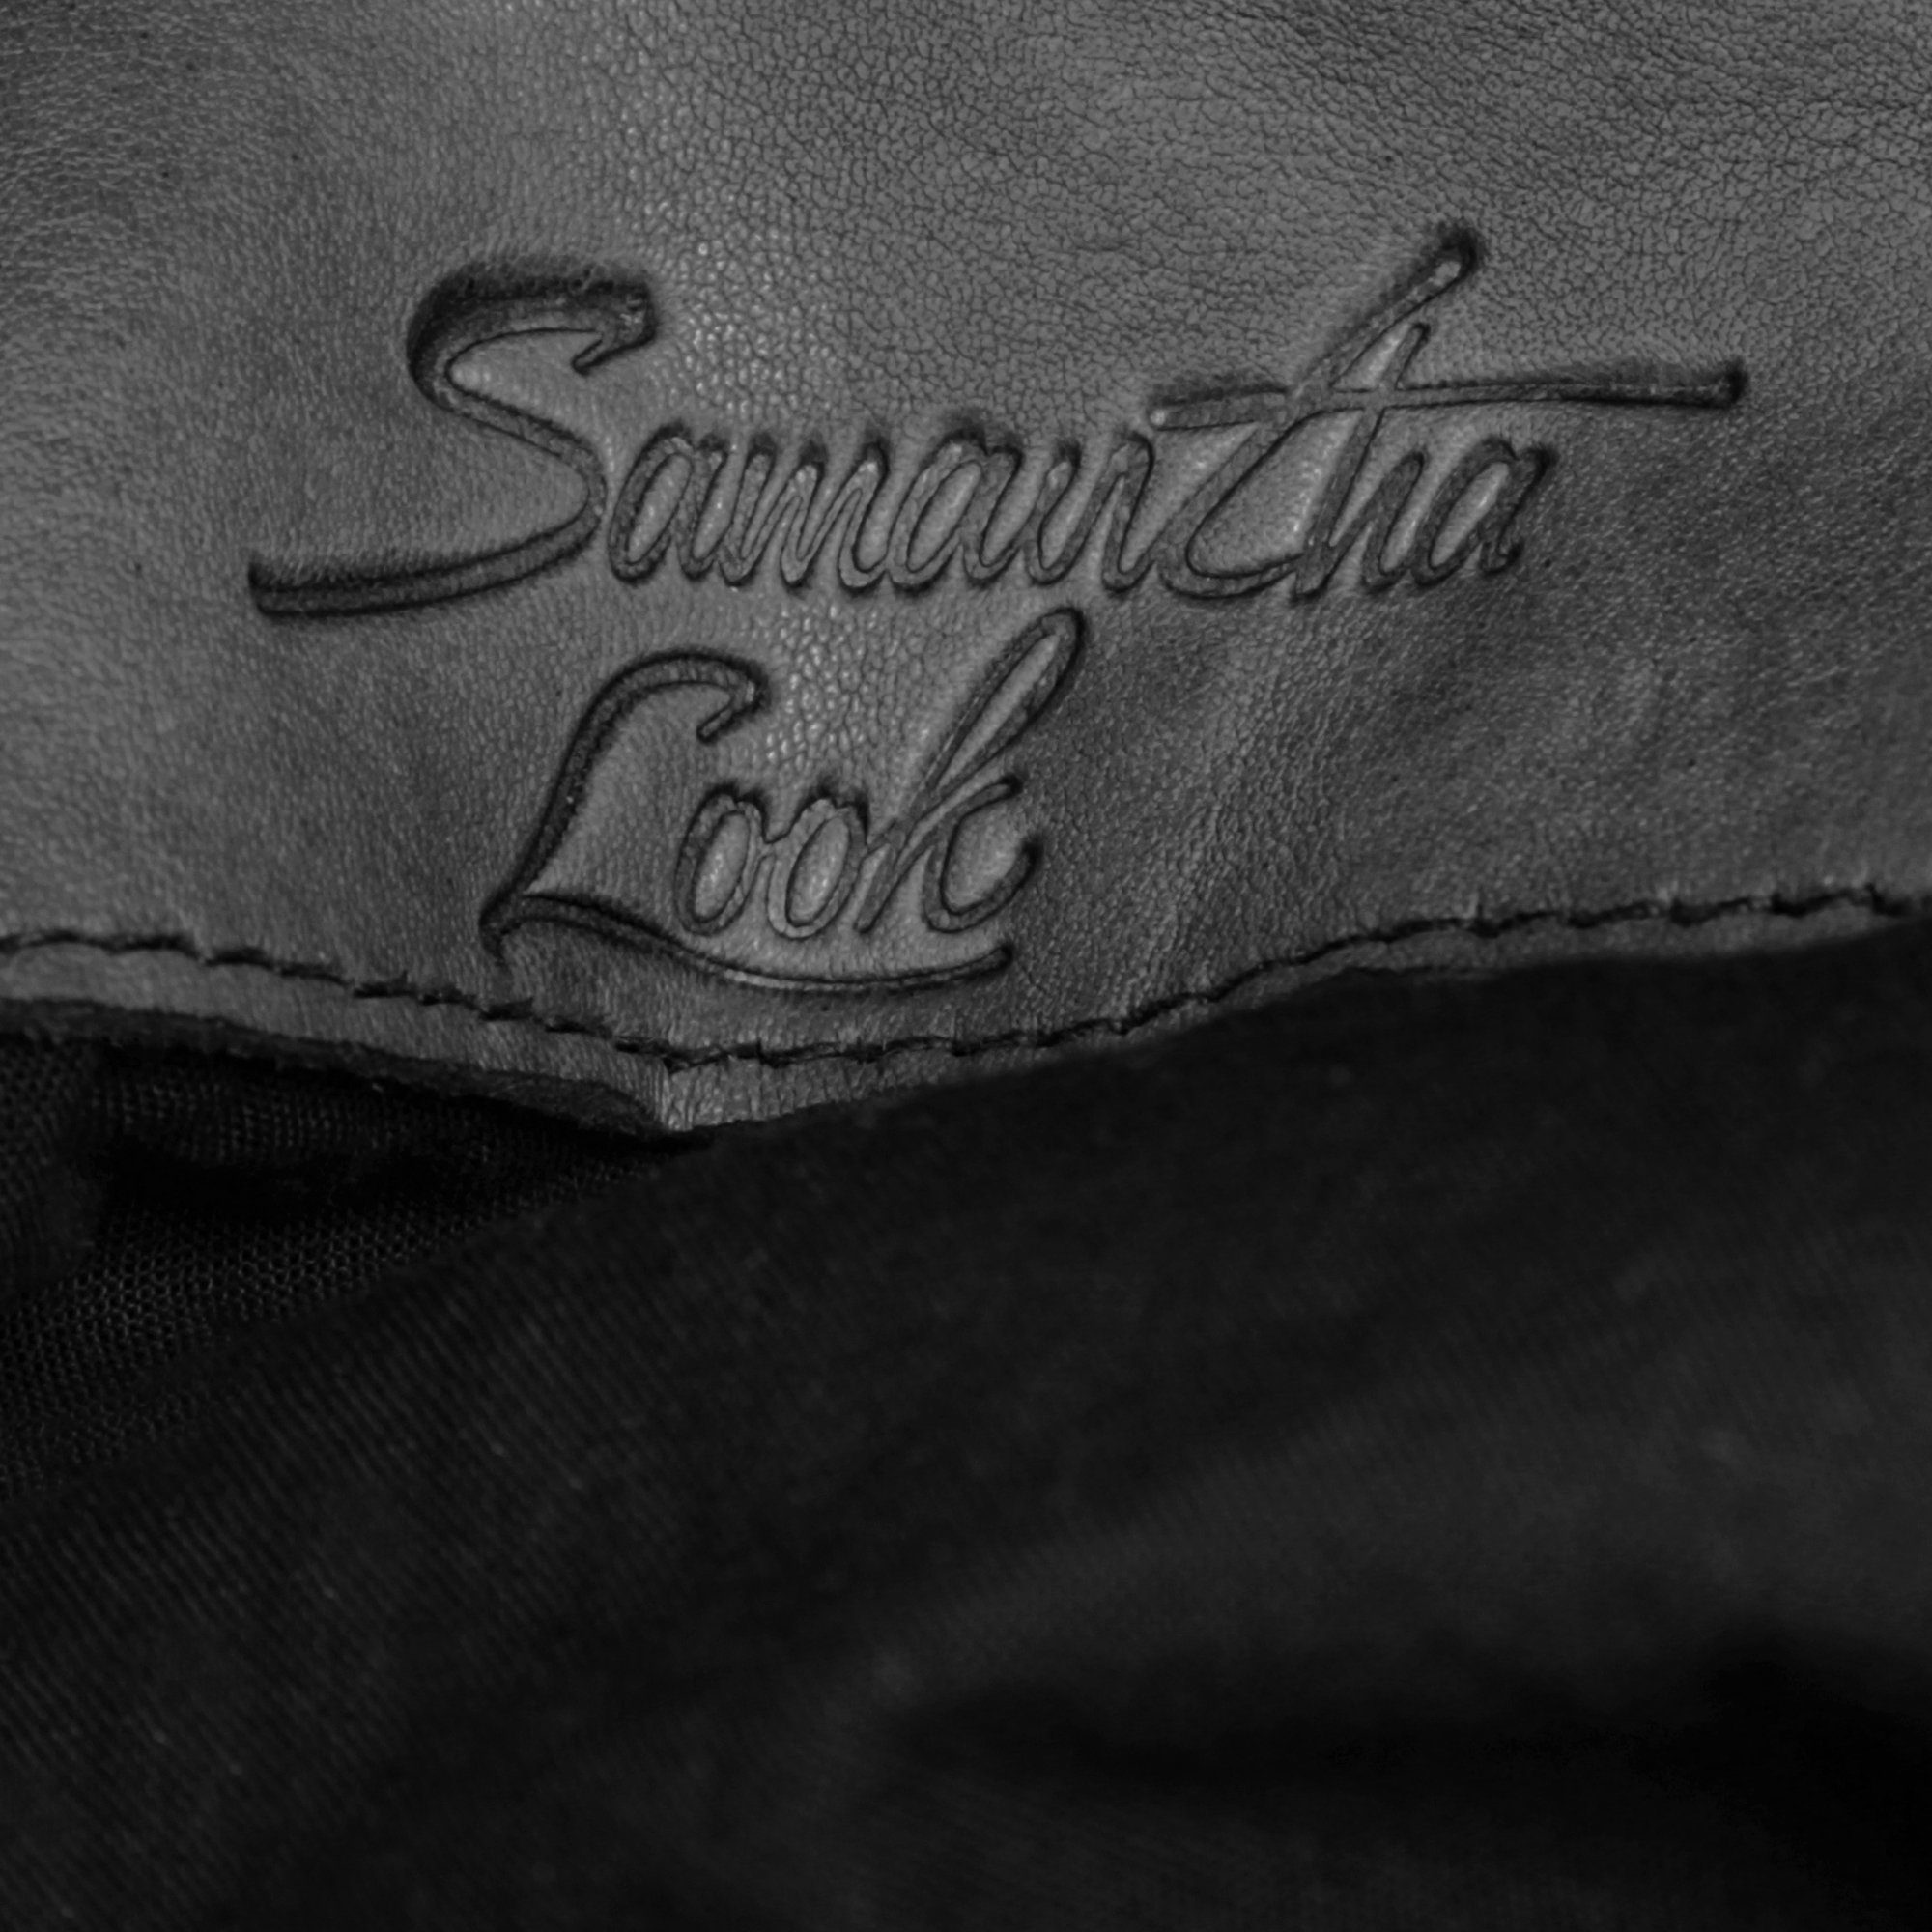 Nu Bij Look Samantha Samantha Look ShopperBestel ShopperBestel WH92EYDbeI